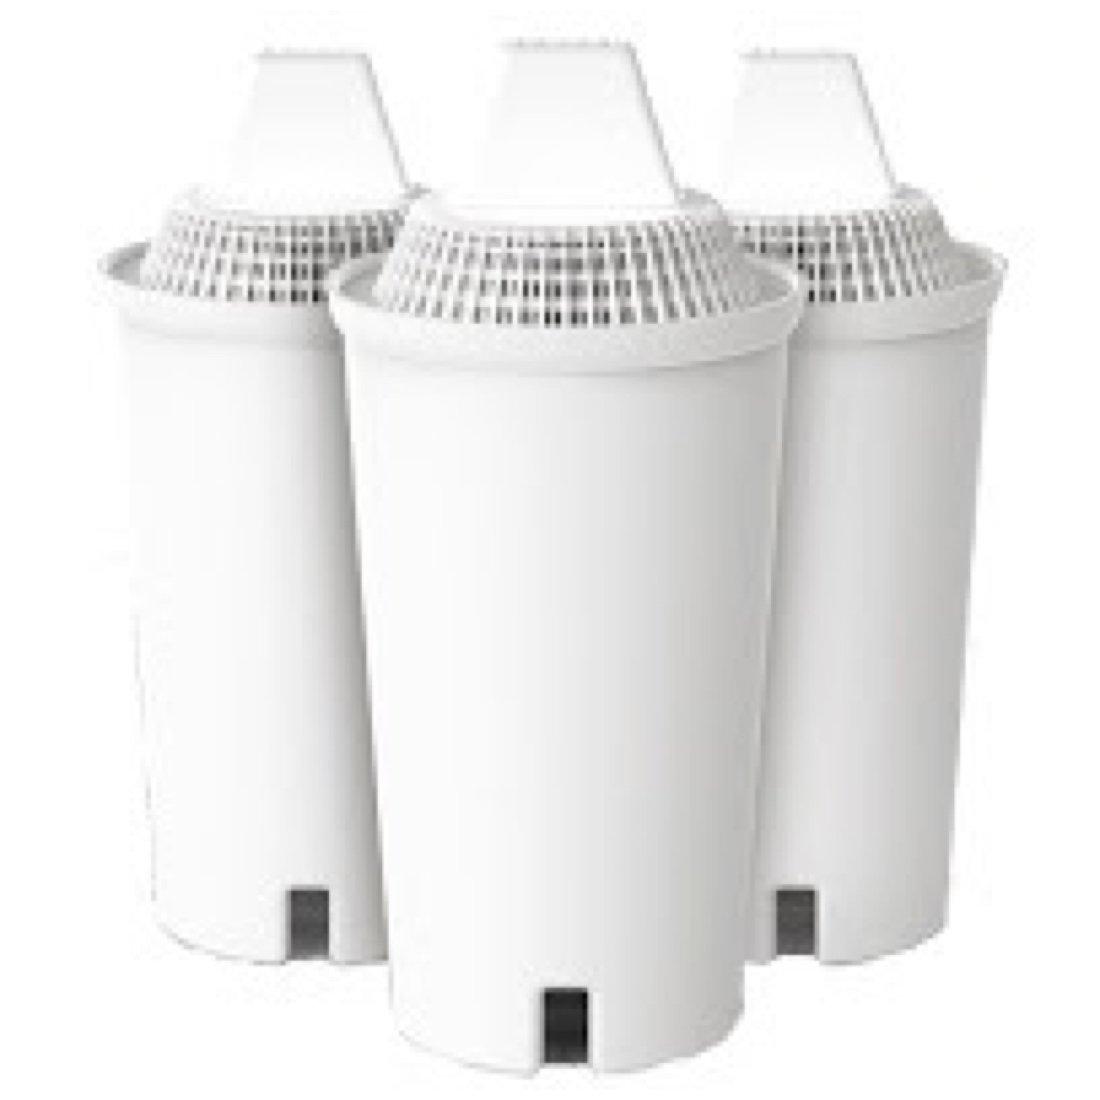 Alkapitcher Brand Alkaline Water Pitcher Filter 3 Pack Replacement - For Alkapitcher Brand Only.